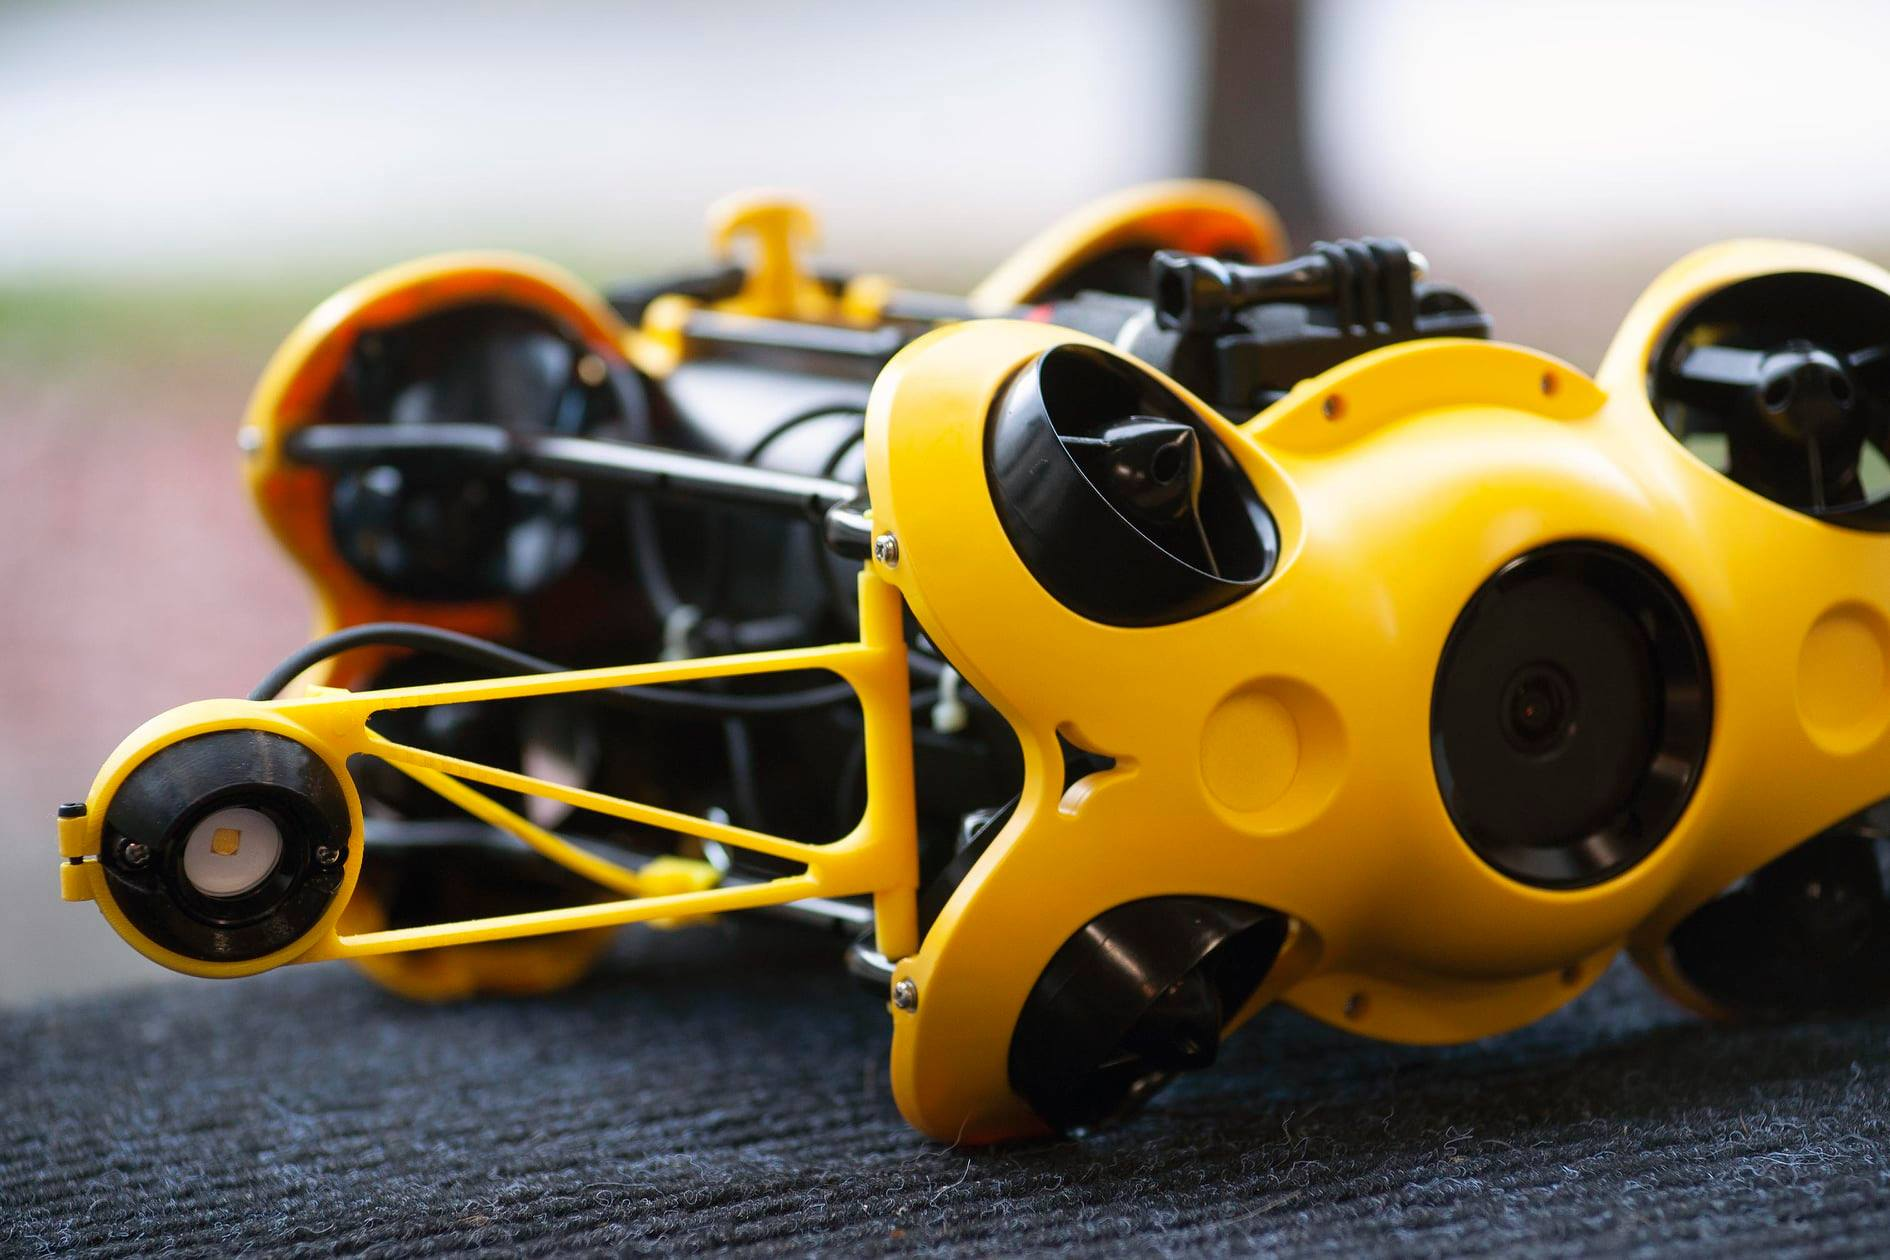 chasing-m2-underwater-drone-modification.jpg